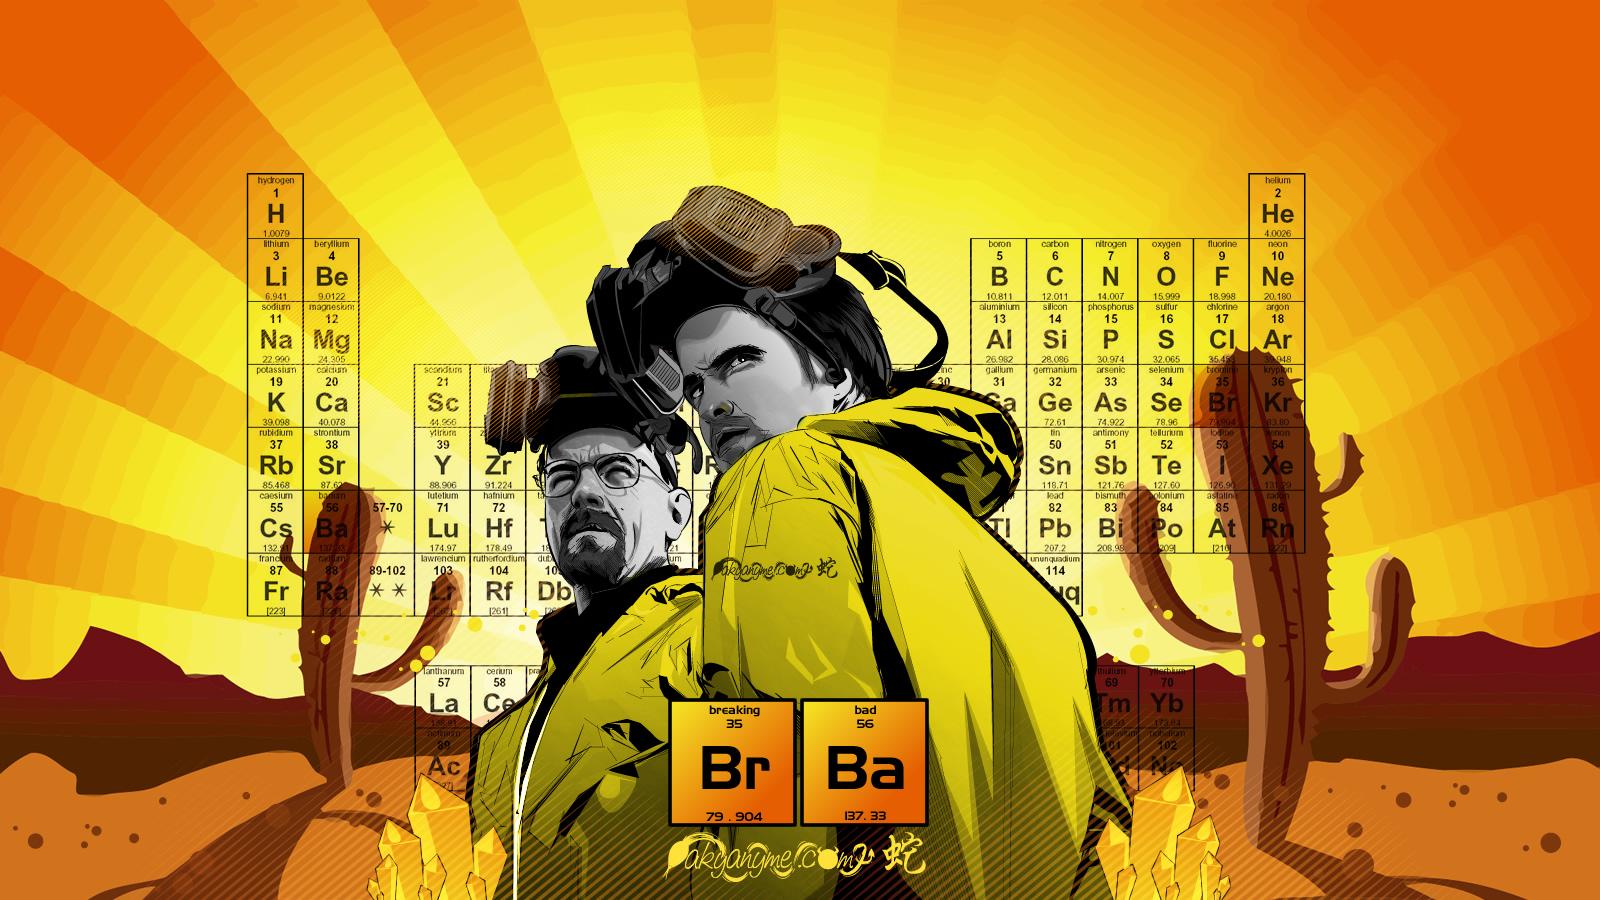 Breaking Bad   Breaking Bad Wallpaper 37307233 1600x900